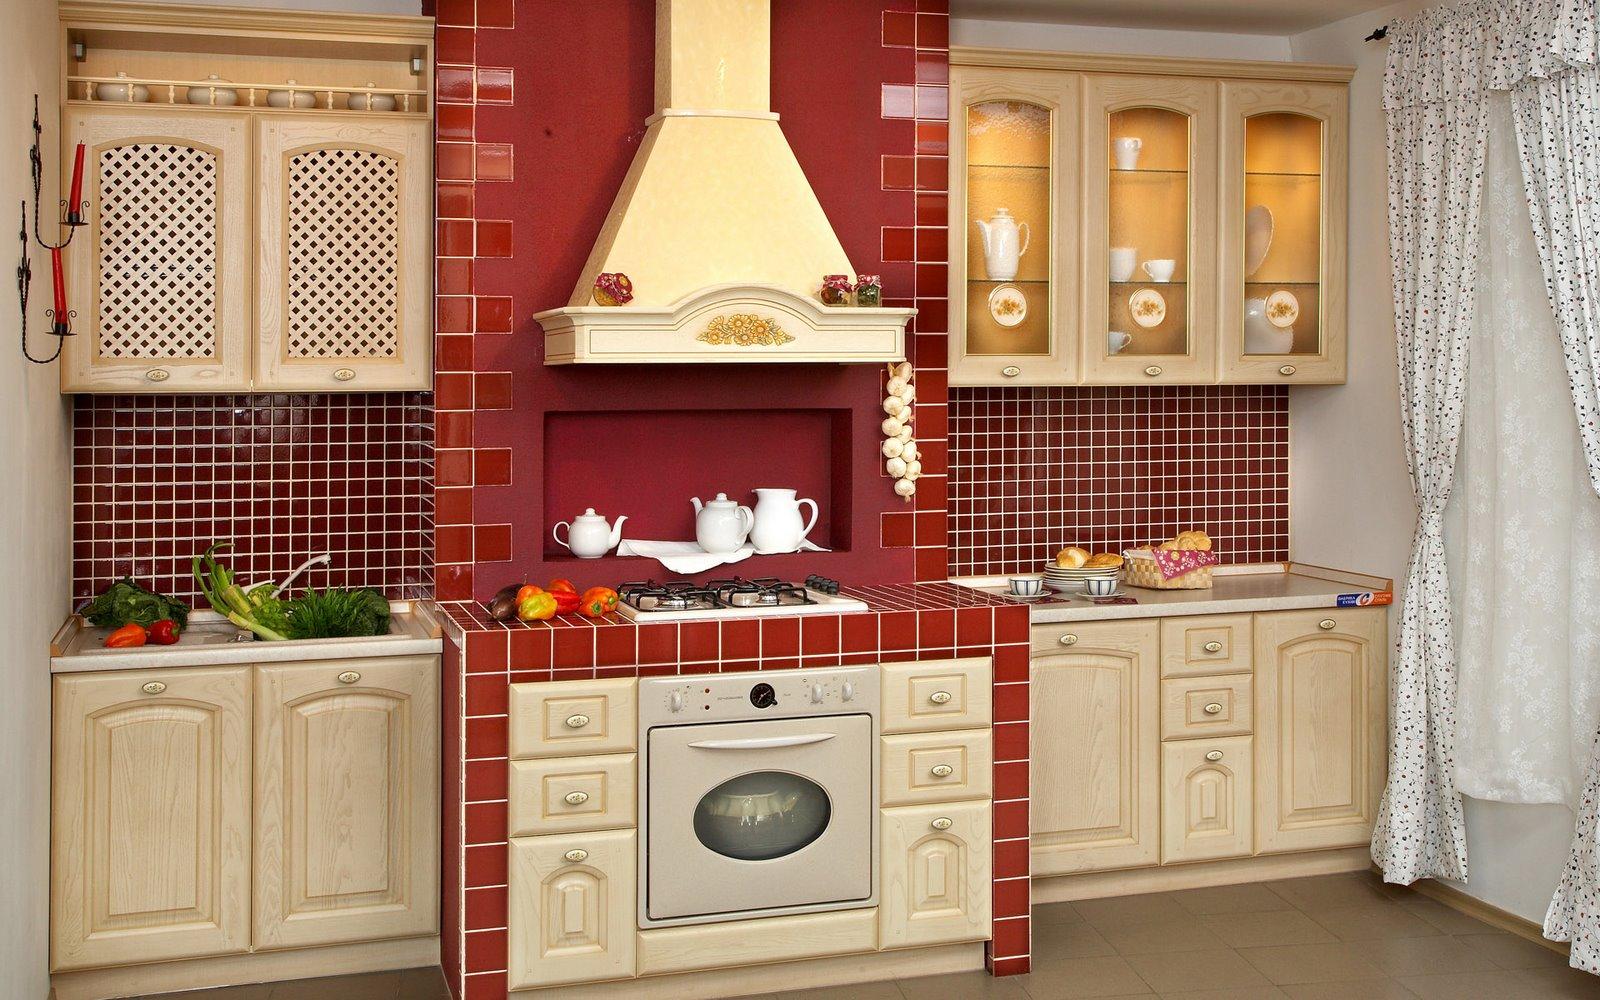 Retro Red Kitchen Retro Red Kitchen Kitchen Ideas